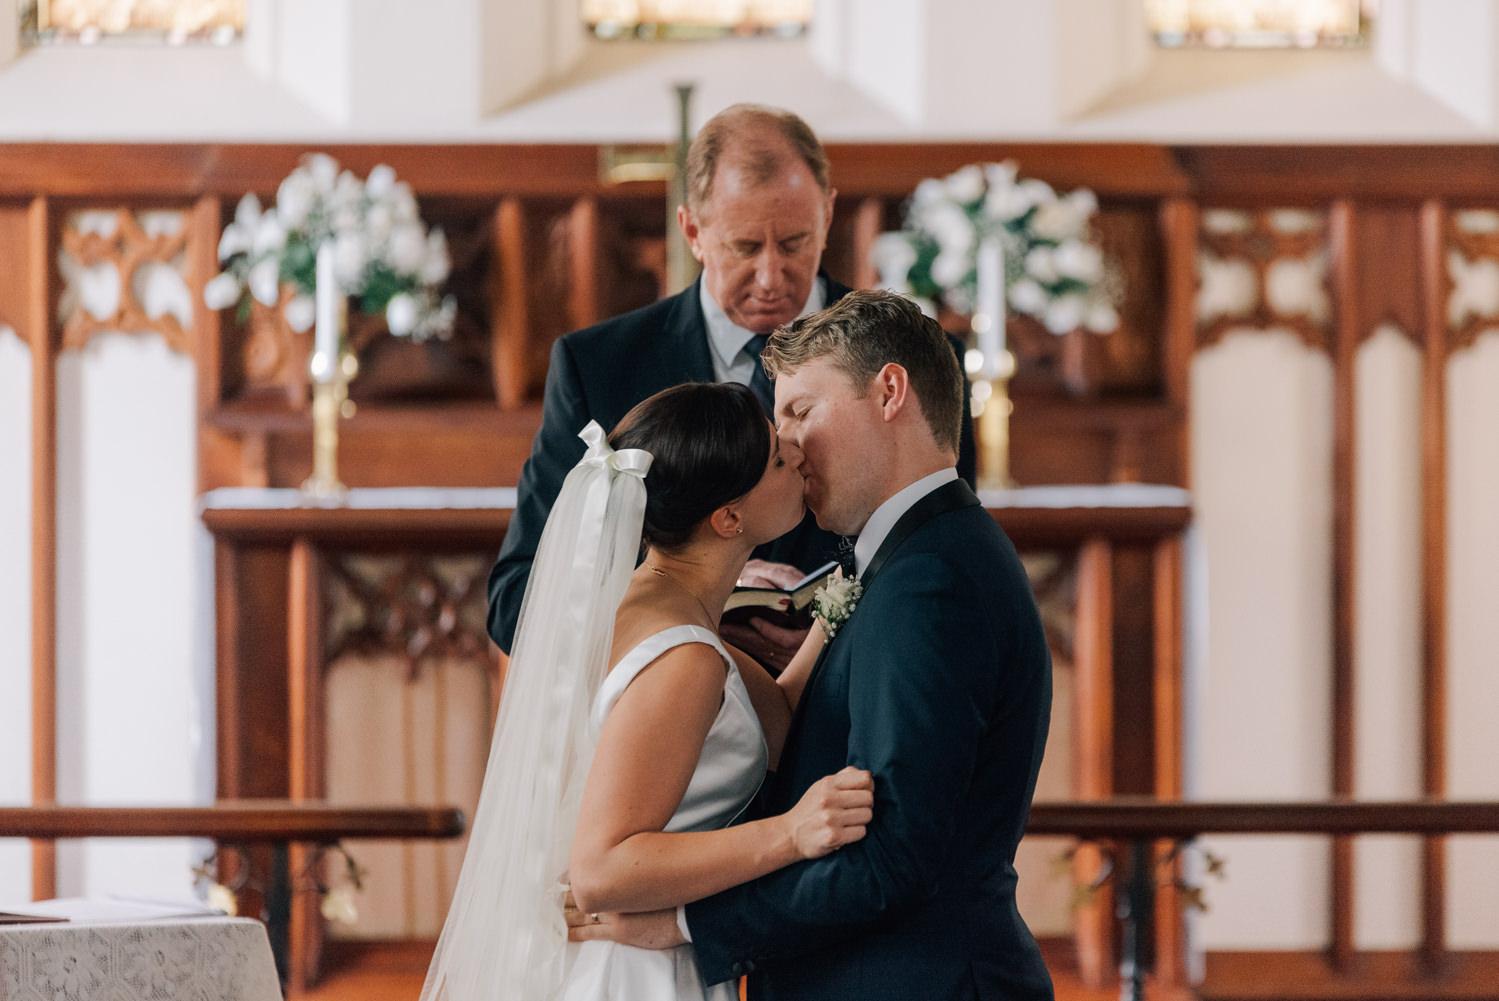 Josef-Chromy-Wedding-Photographer-32.jpg